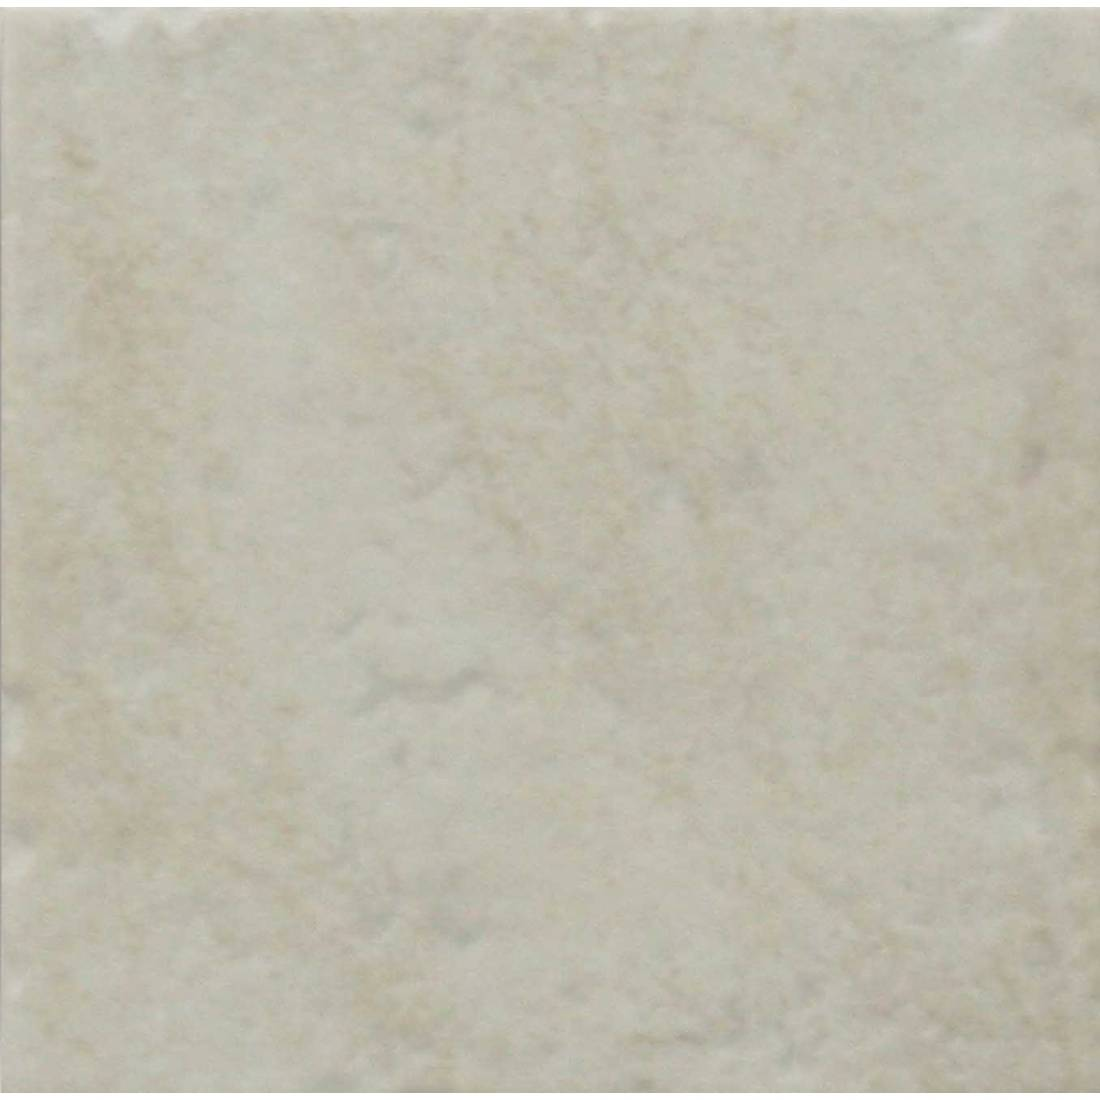 Onice 10x10 Bianco Matt 1